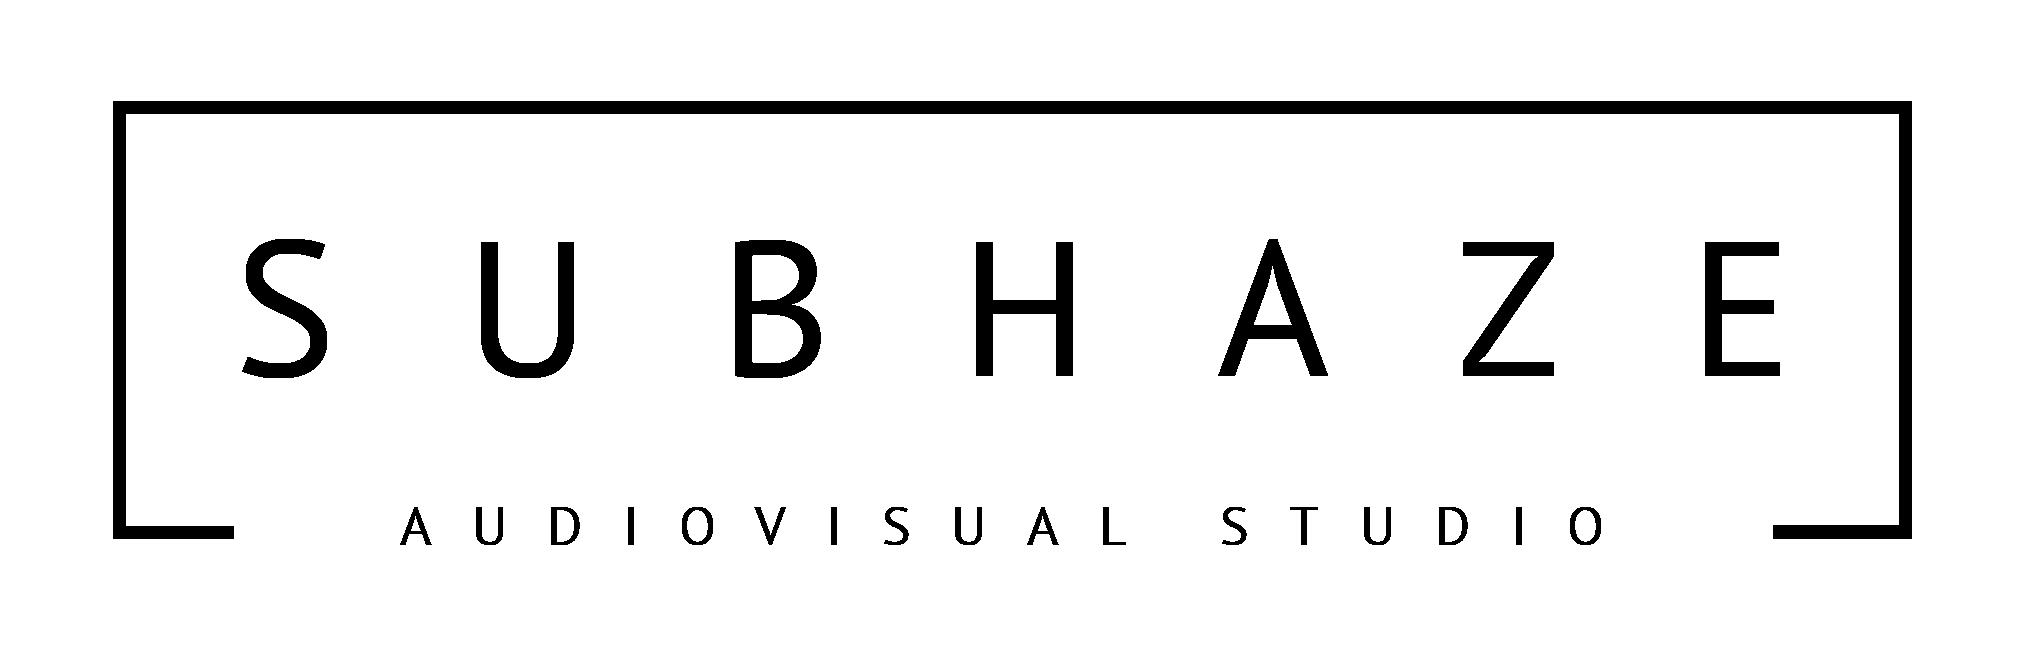 SUBHAZE STUDIO Logo